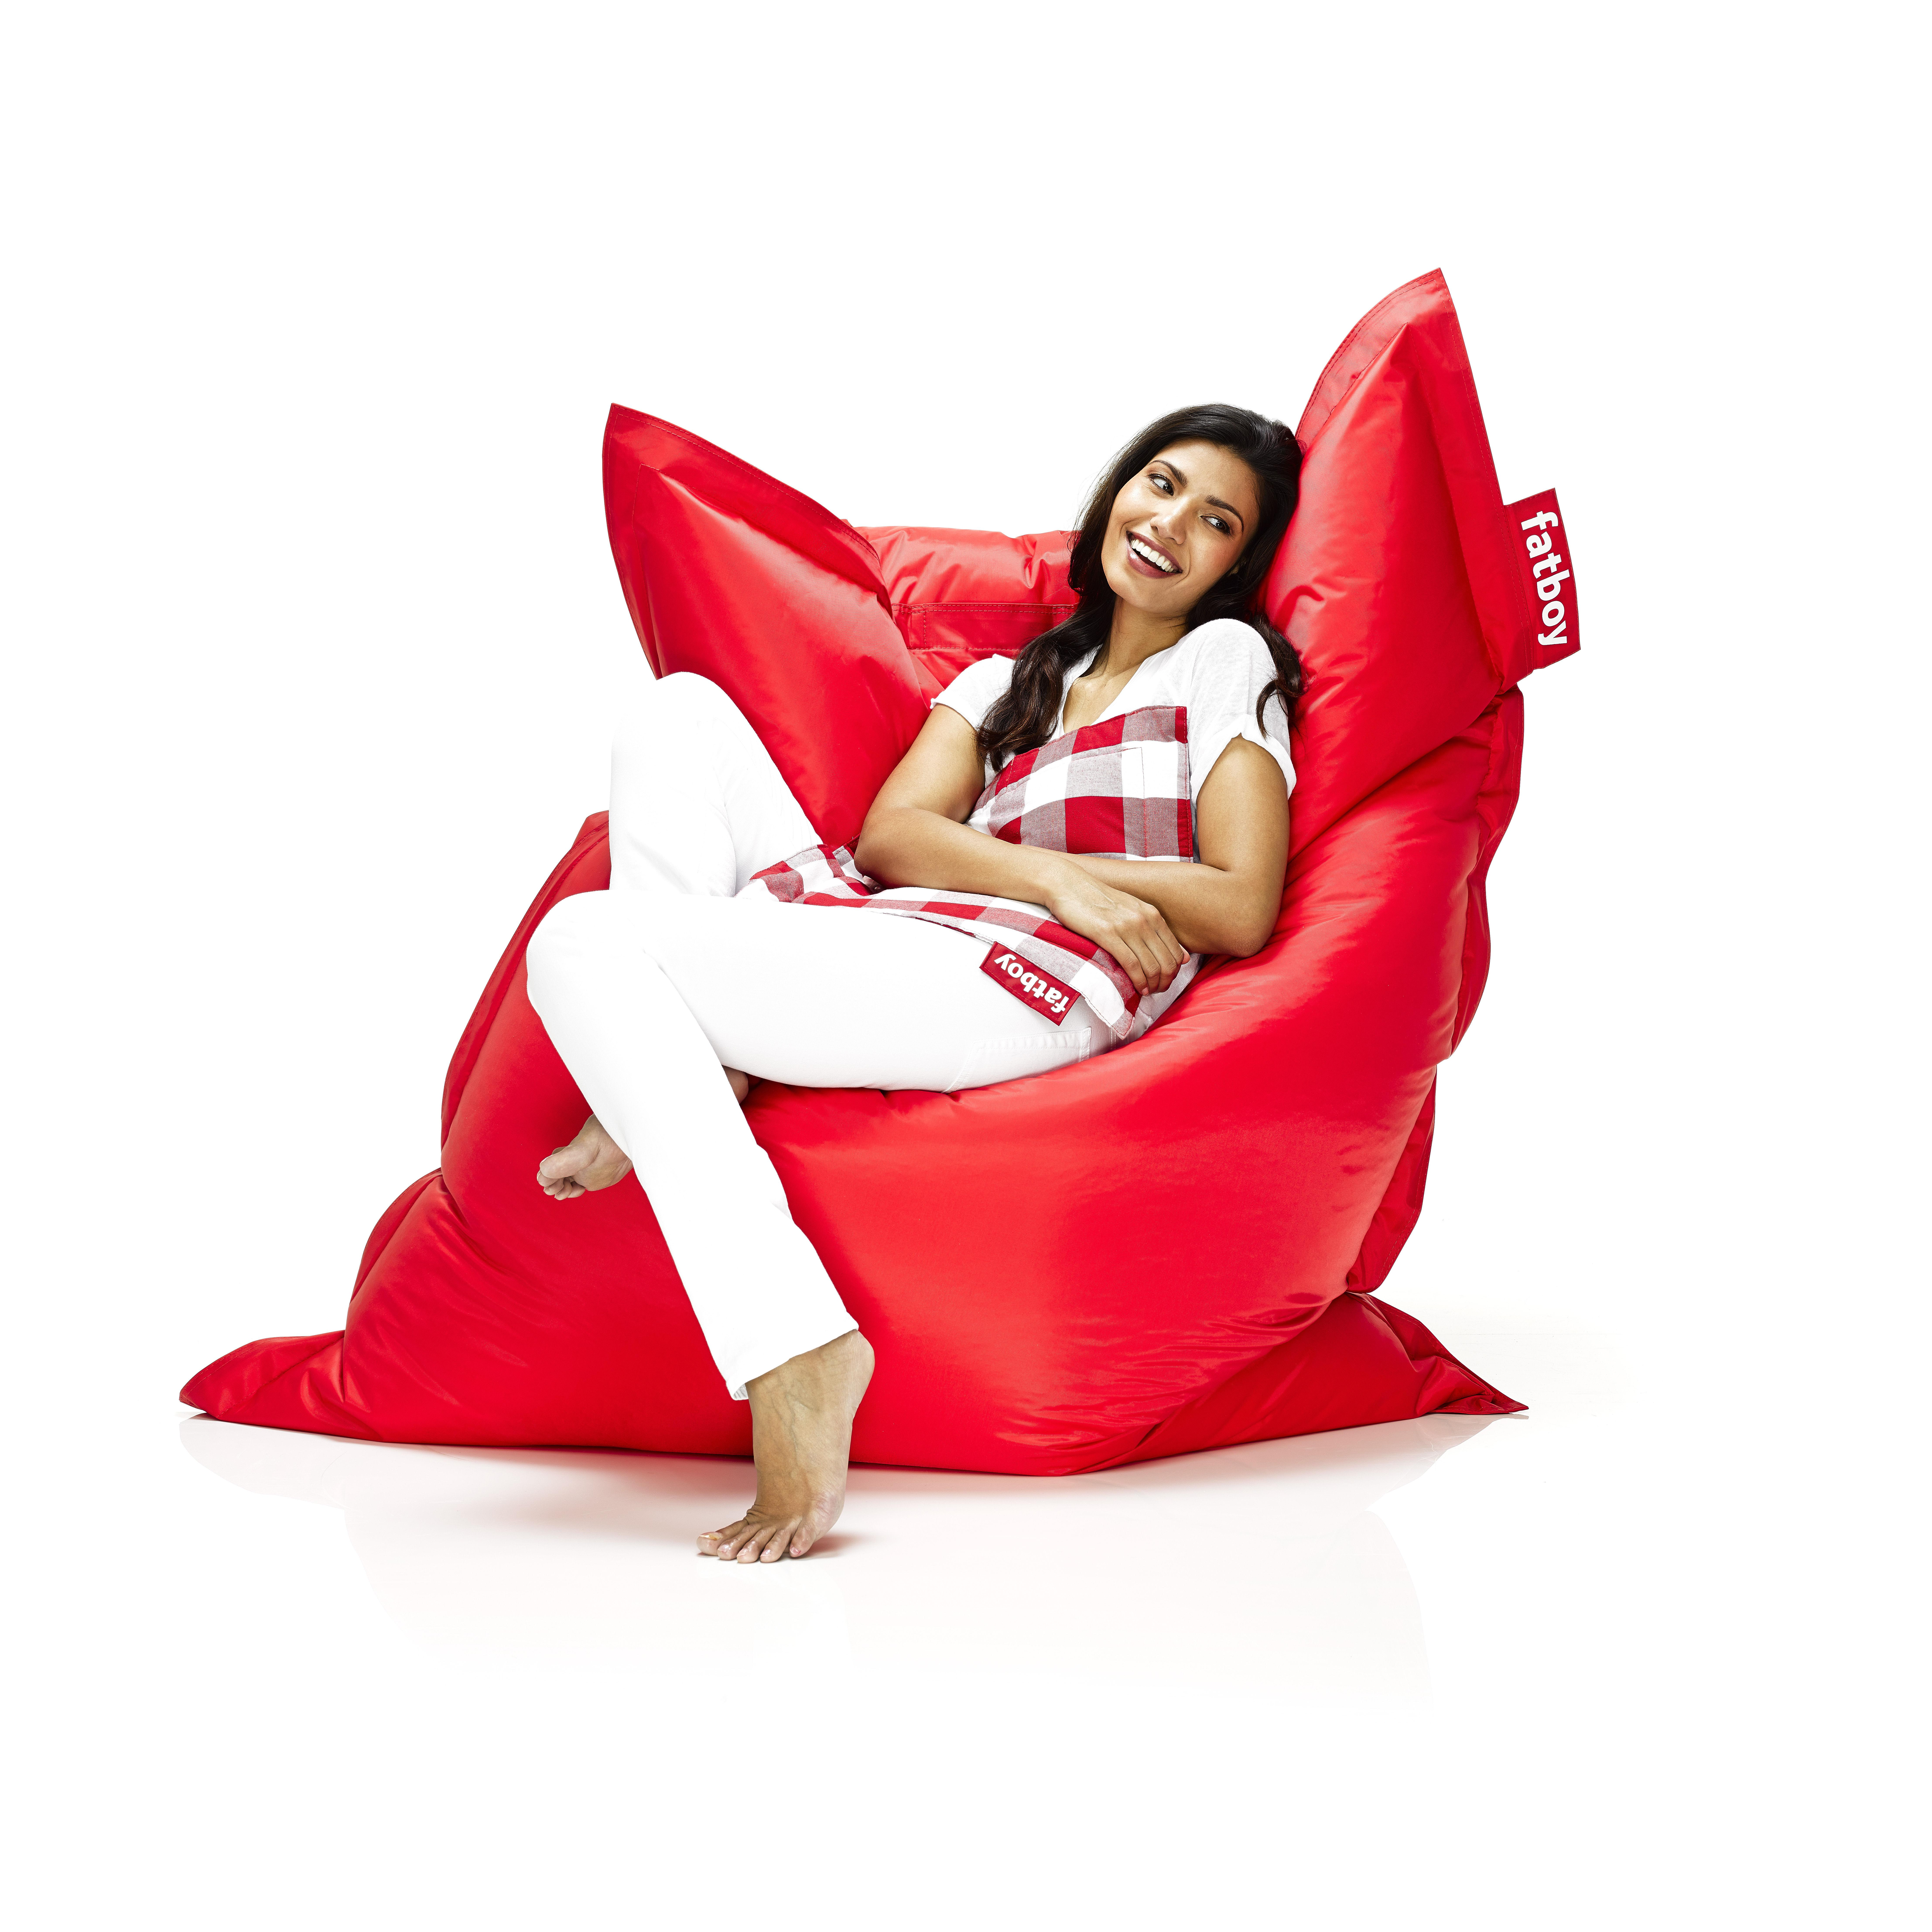 coussin desswerrum bouillotte coussin vichy rouge fatboy. Black Bedroom Furniture Sets. Home Design Ideas